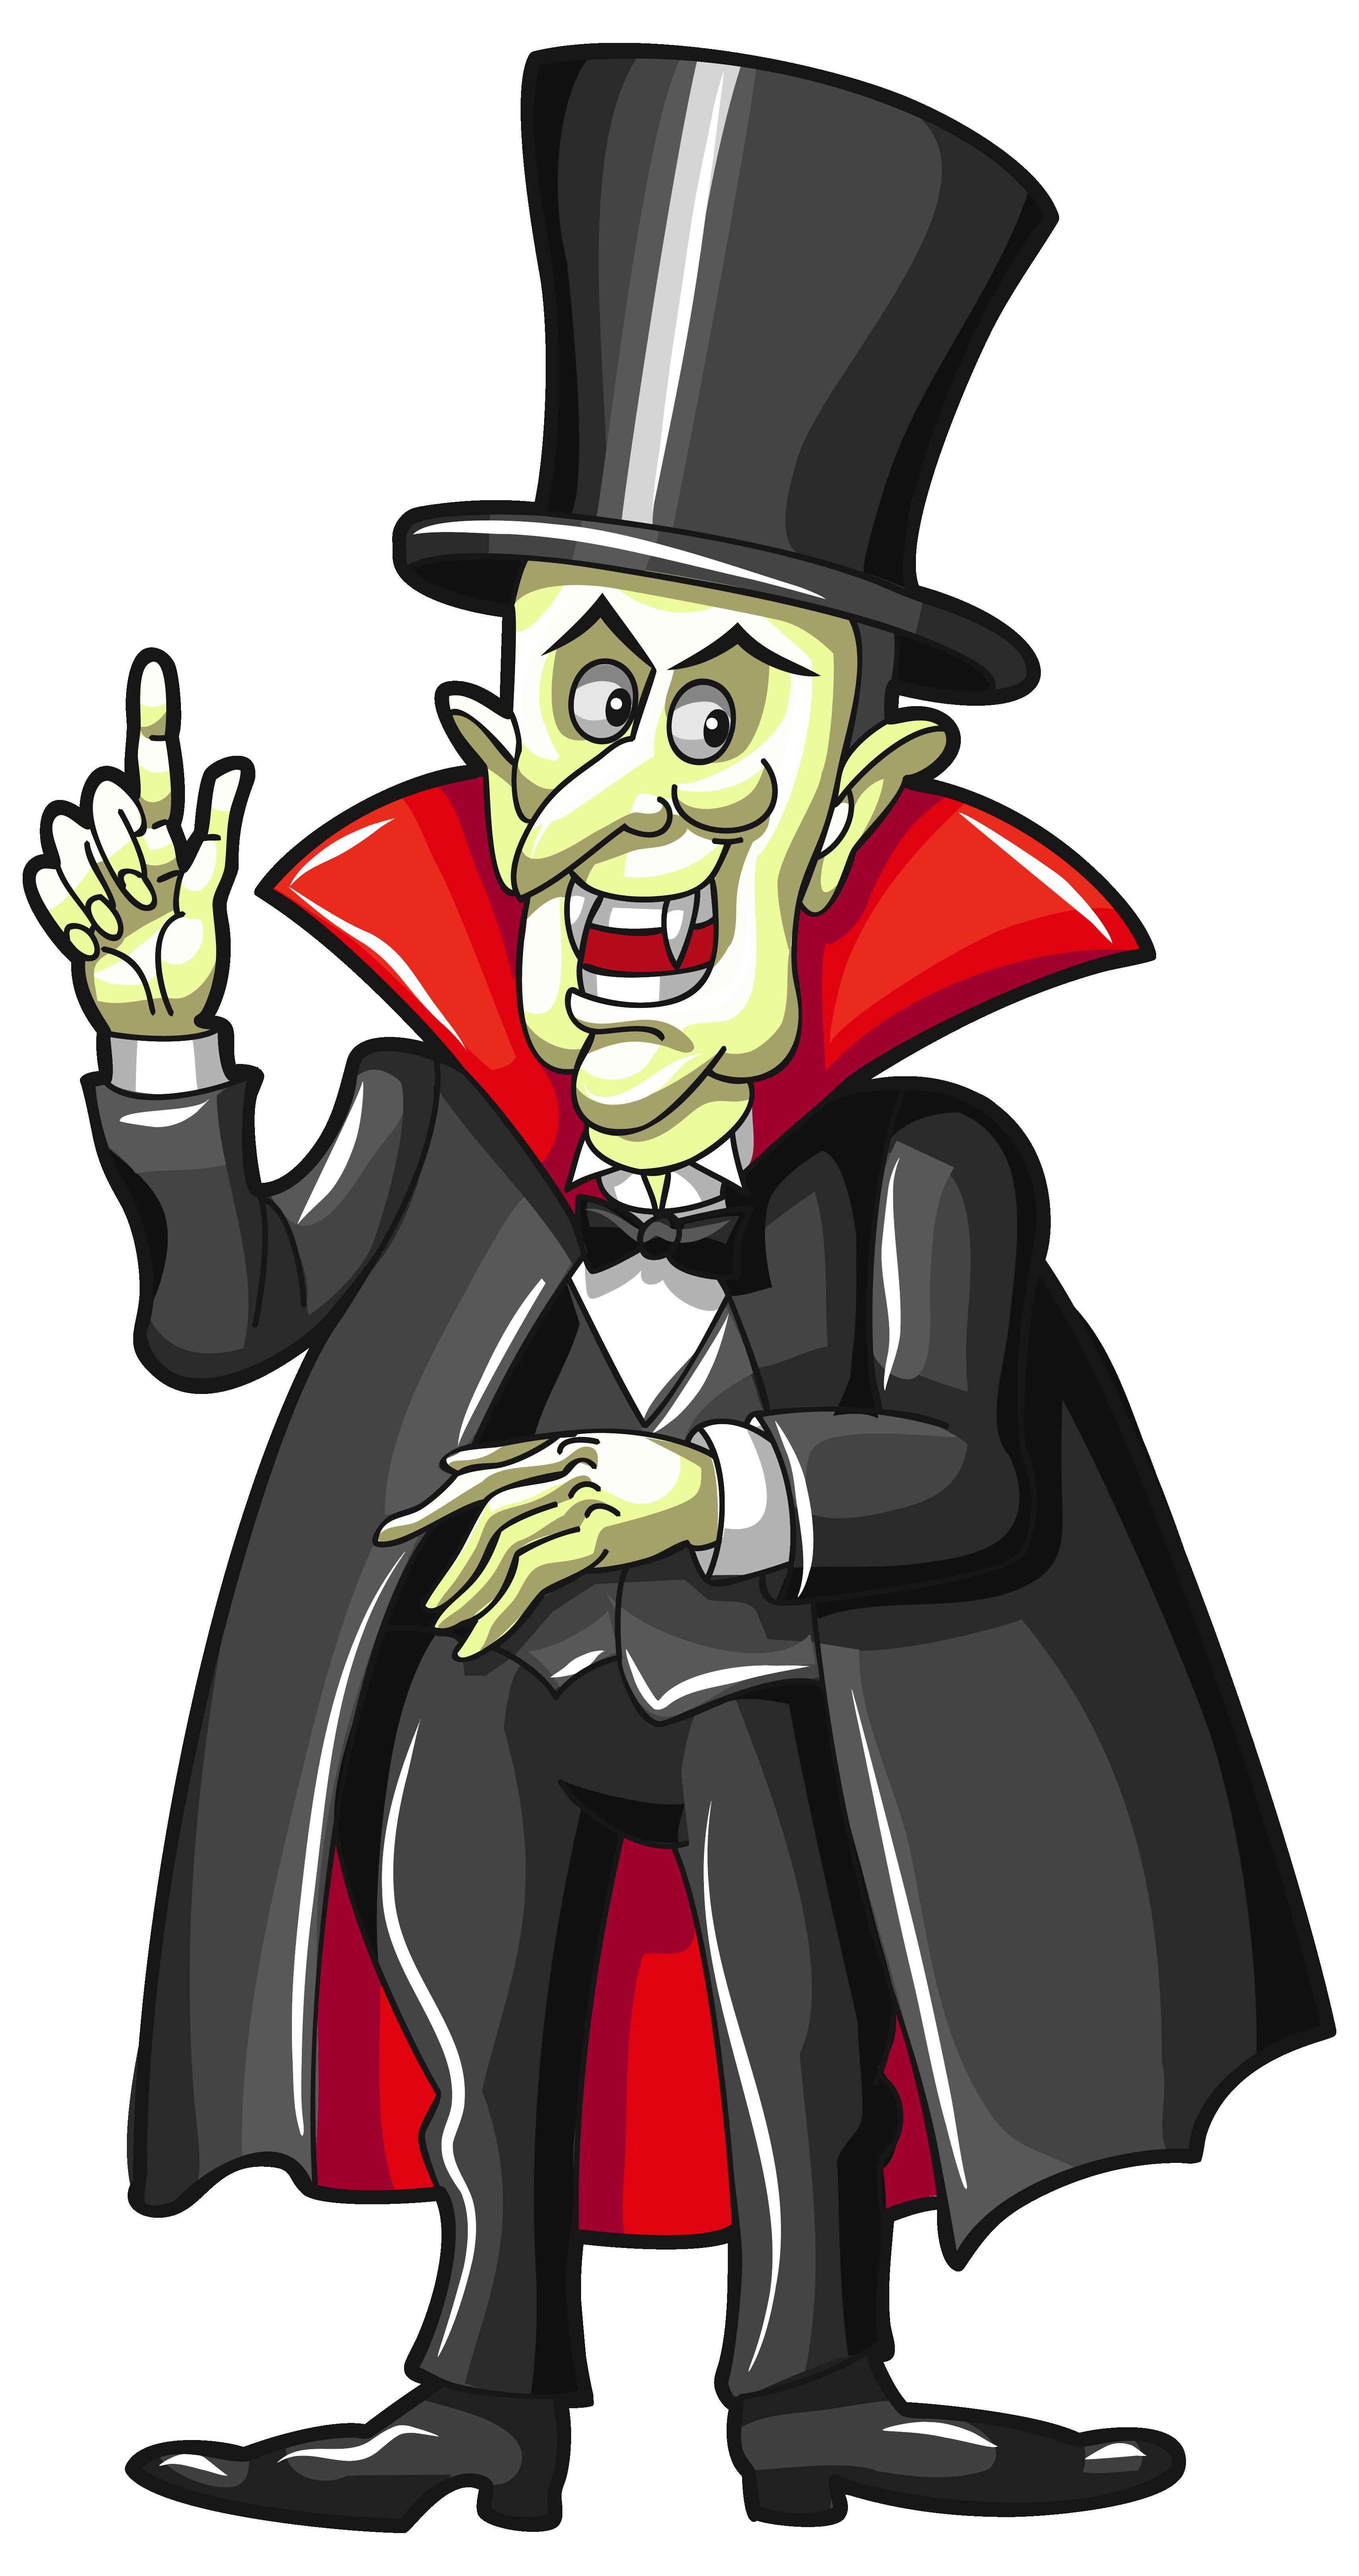 Haunted clipart halloween vampire Yopriceville Halloween PNG Gallery Art